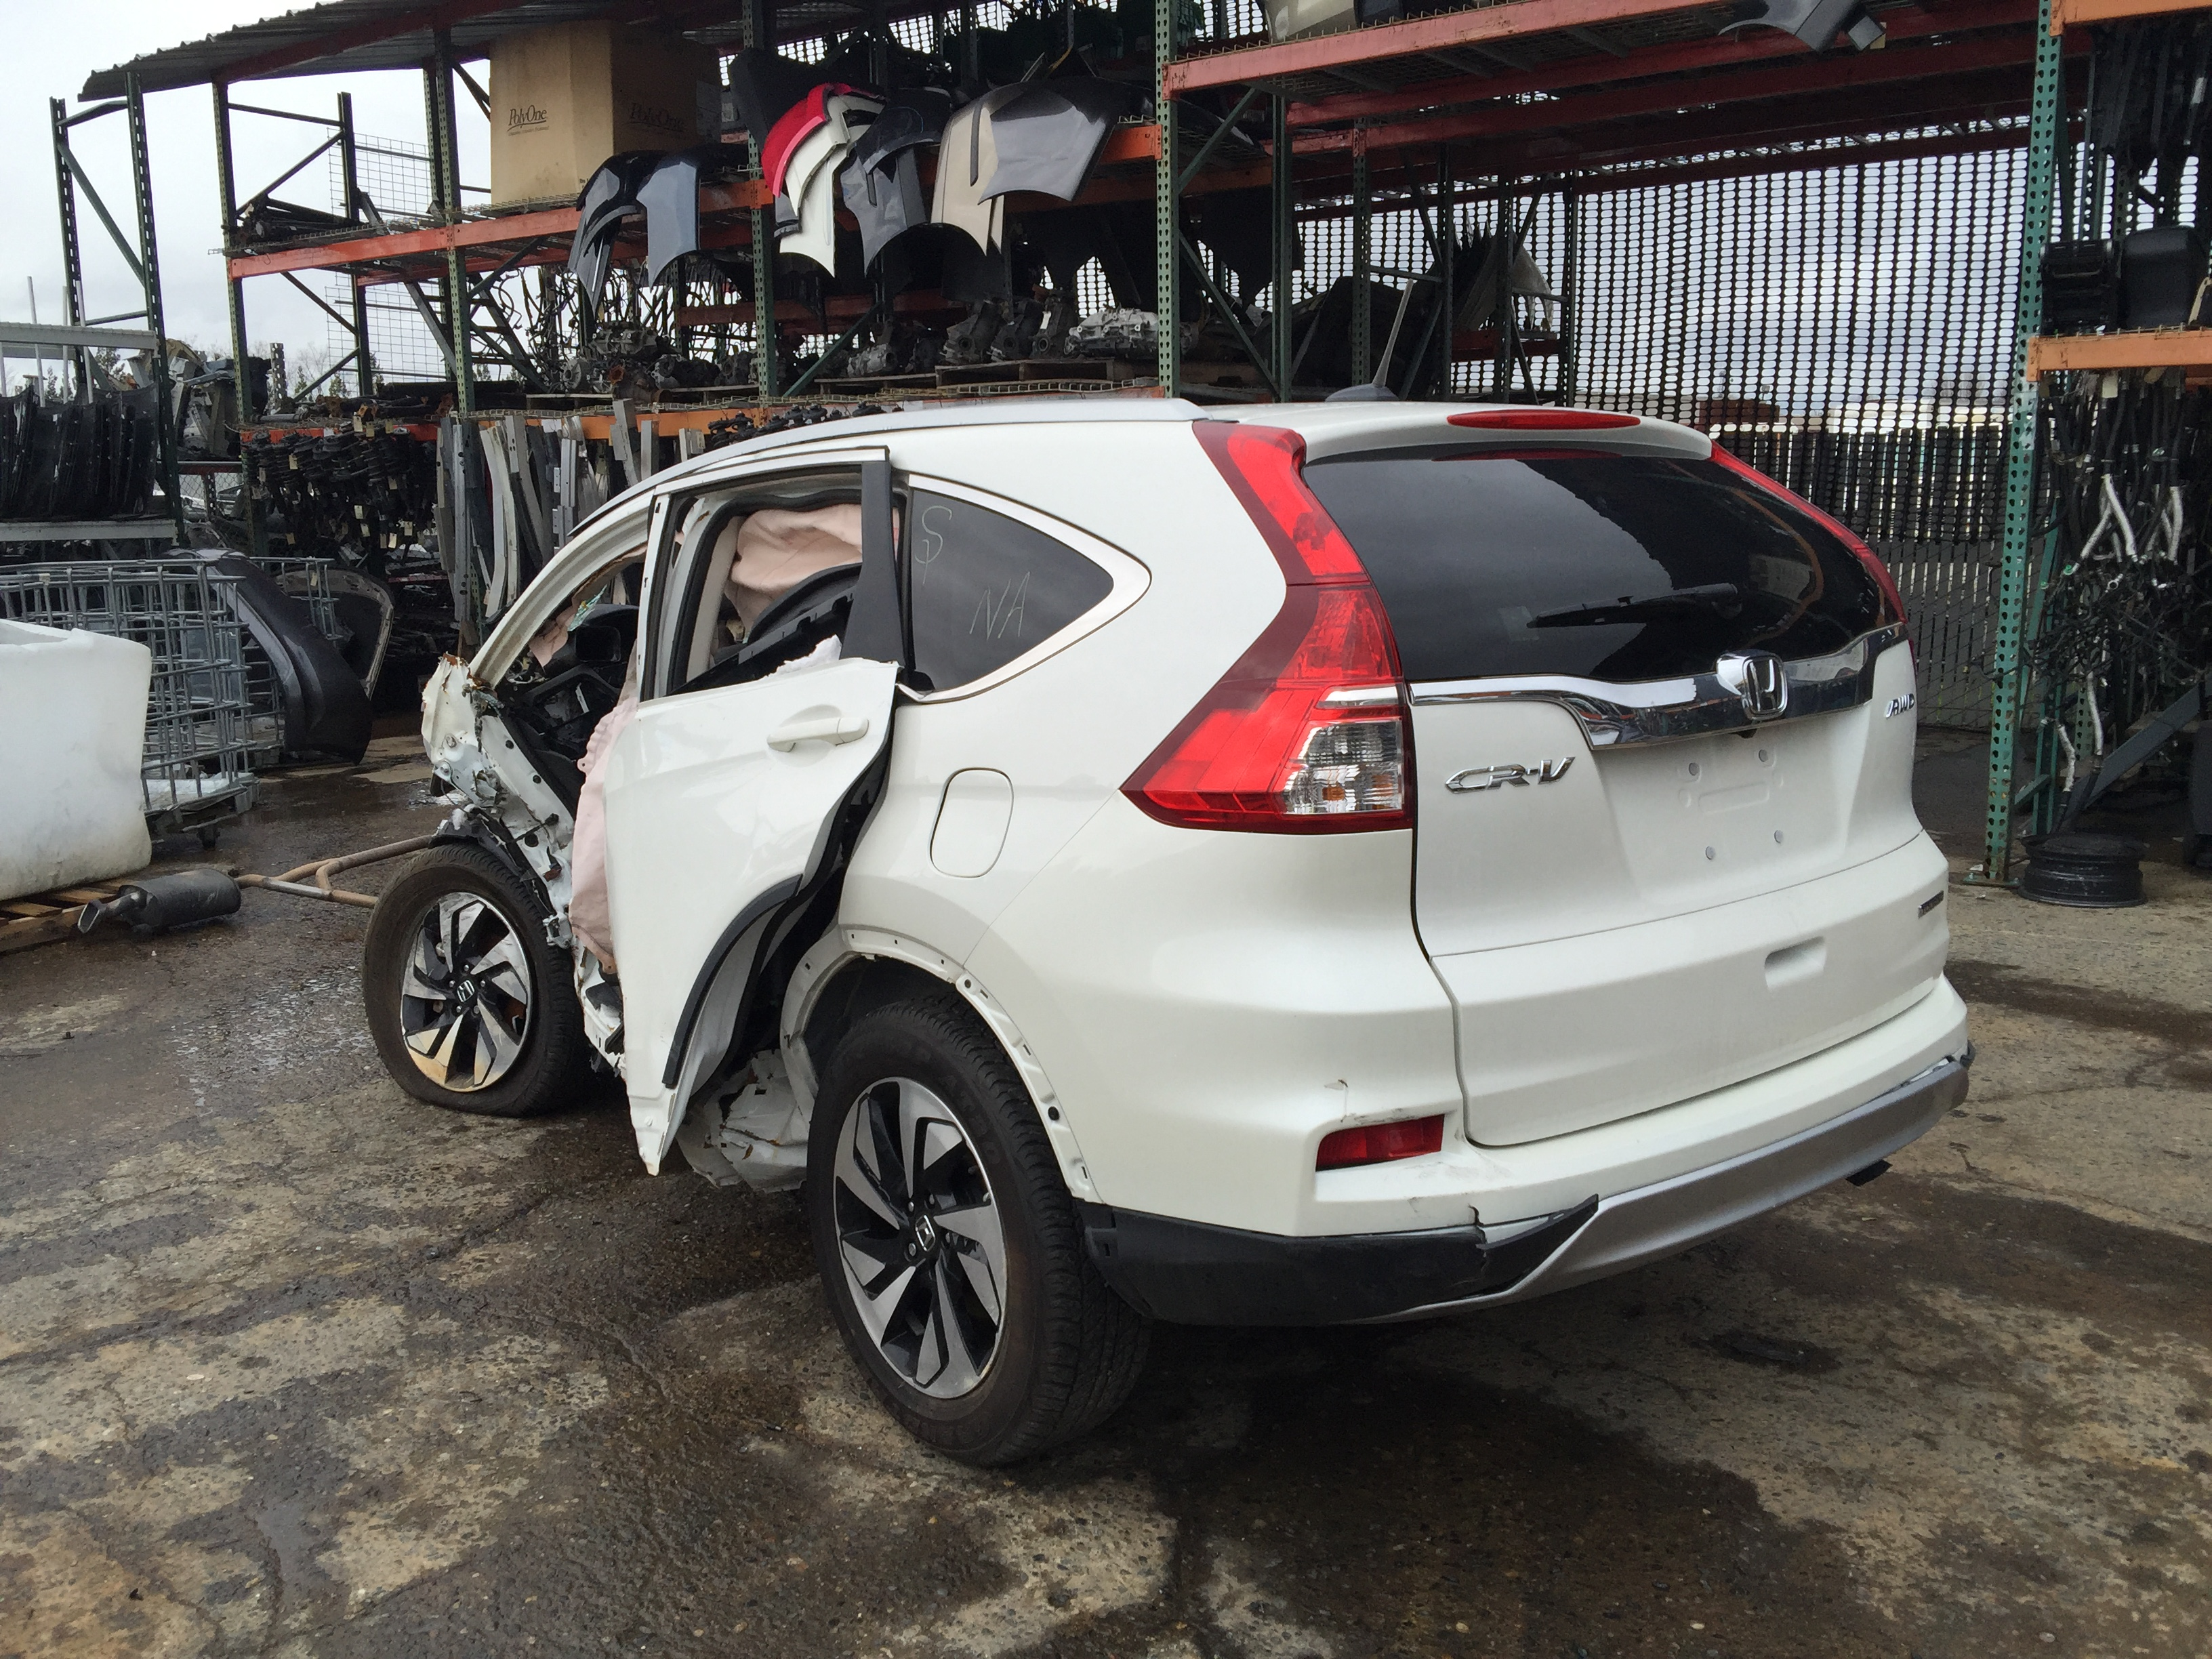 2017 Honda Crv For Sale >> Honda CR-V 2016 Parts For Sale AA0572 - Exreme Auto Parts